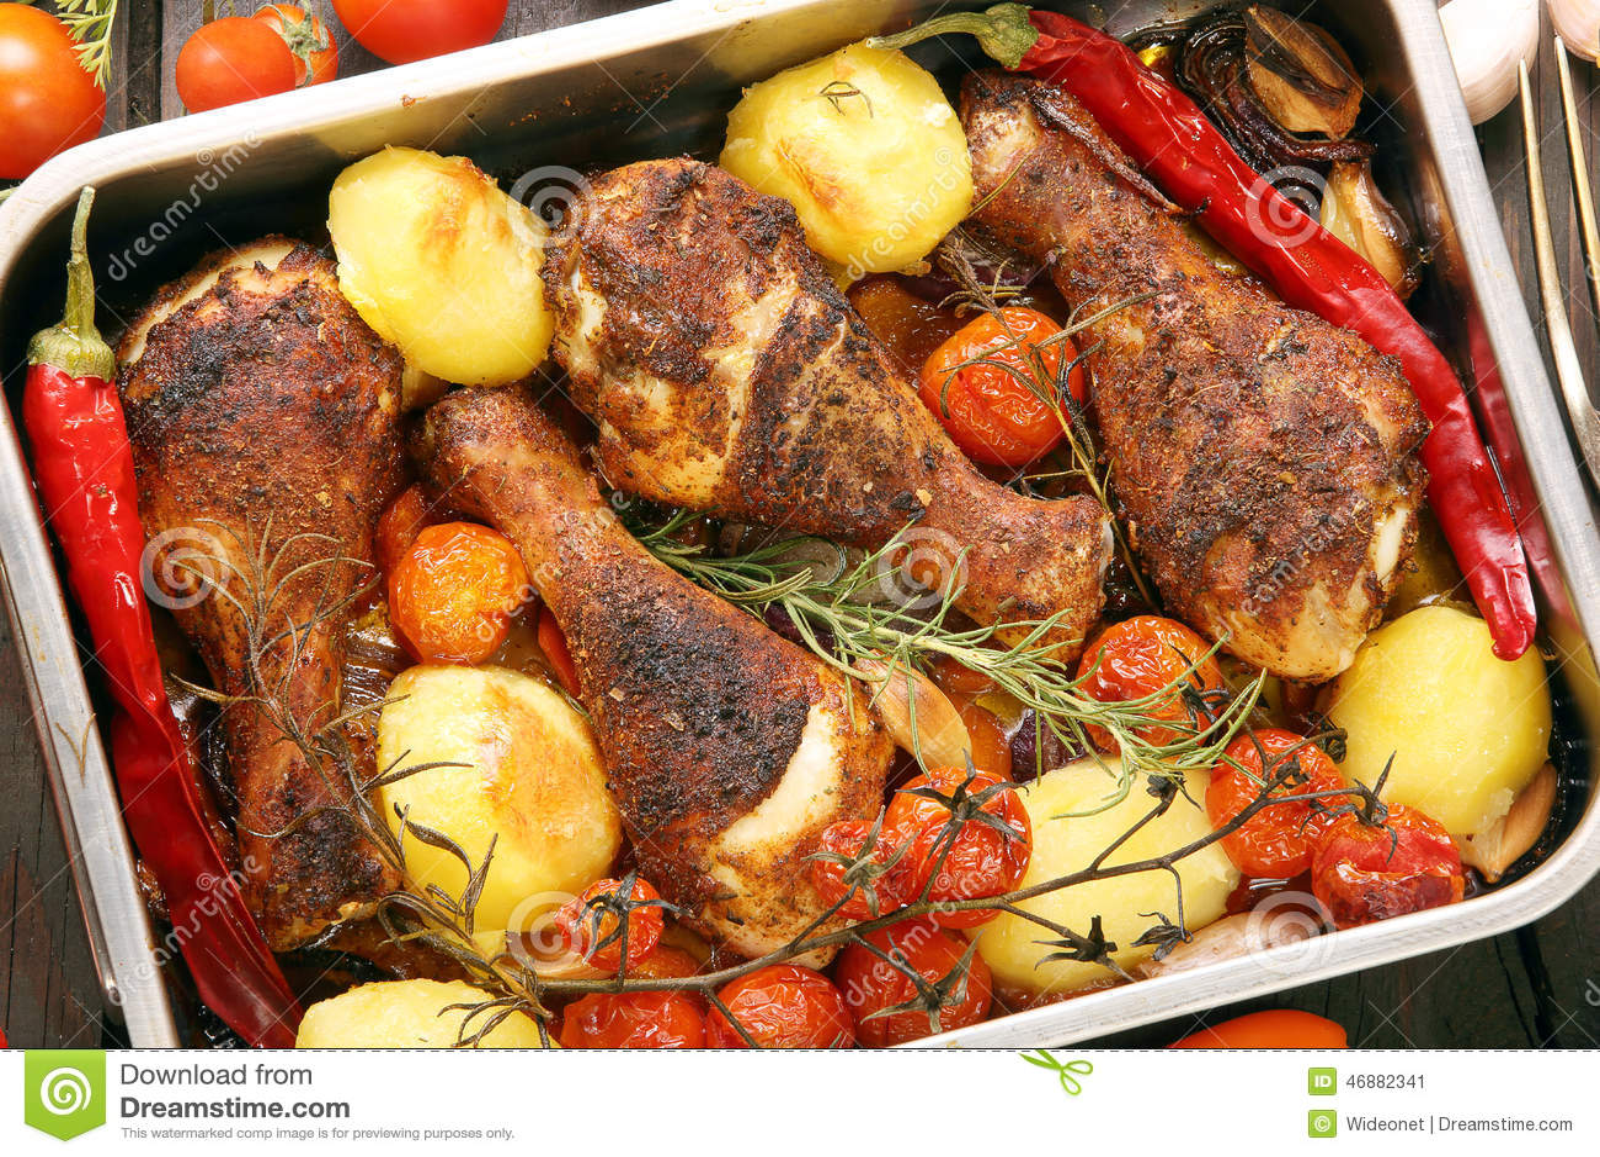 recipe: roasted drumsticks and vegetables [6]